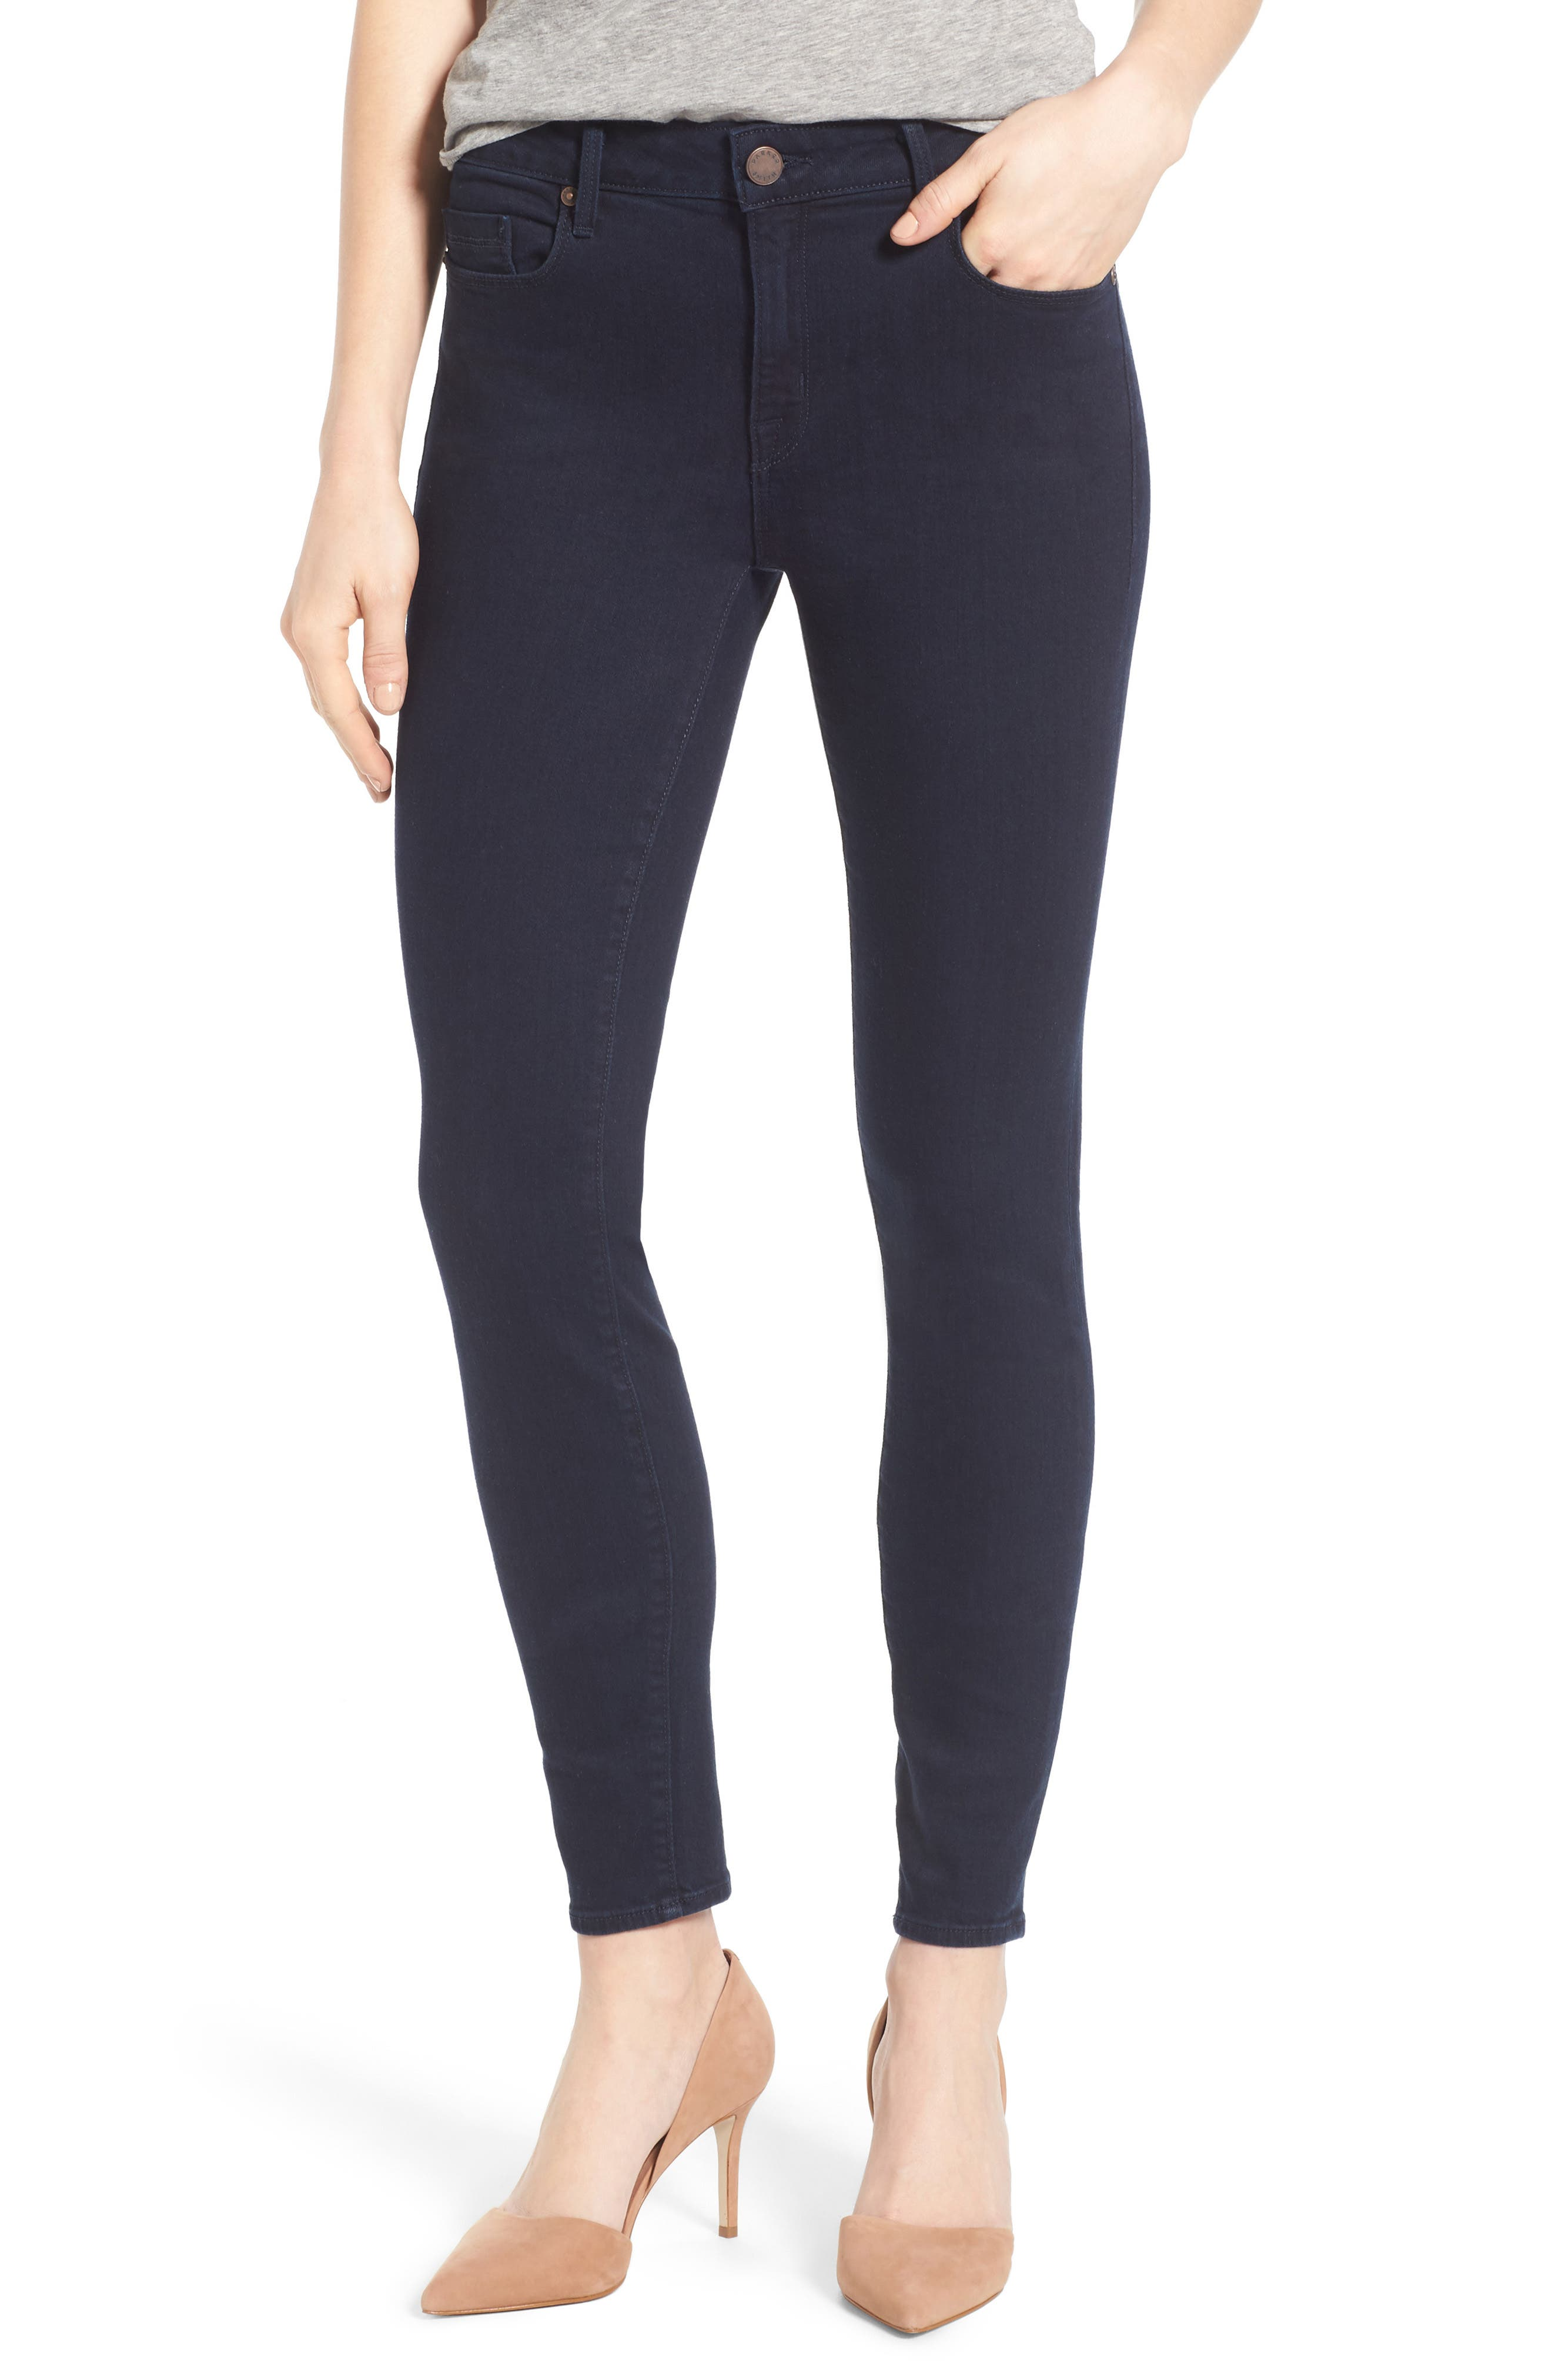 Main Image - PARKER SMITH Ava Stretch Skinny Jeans (Nautical)